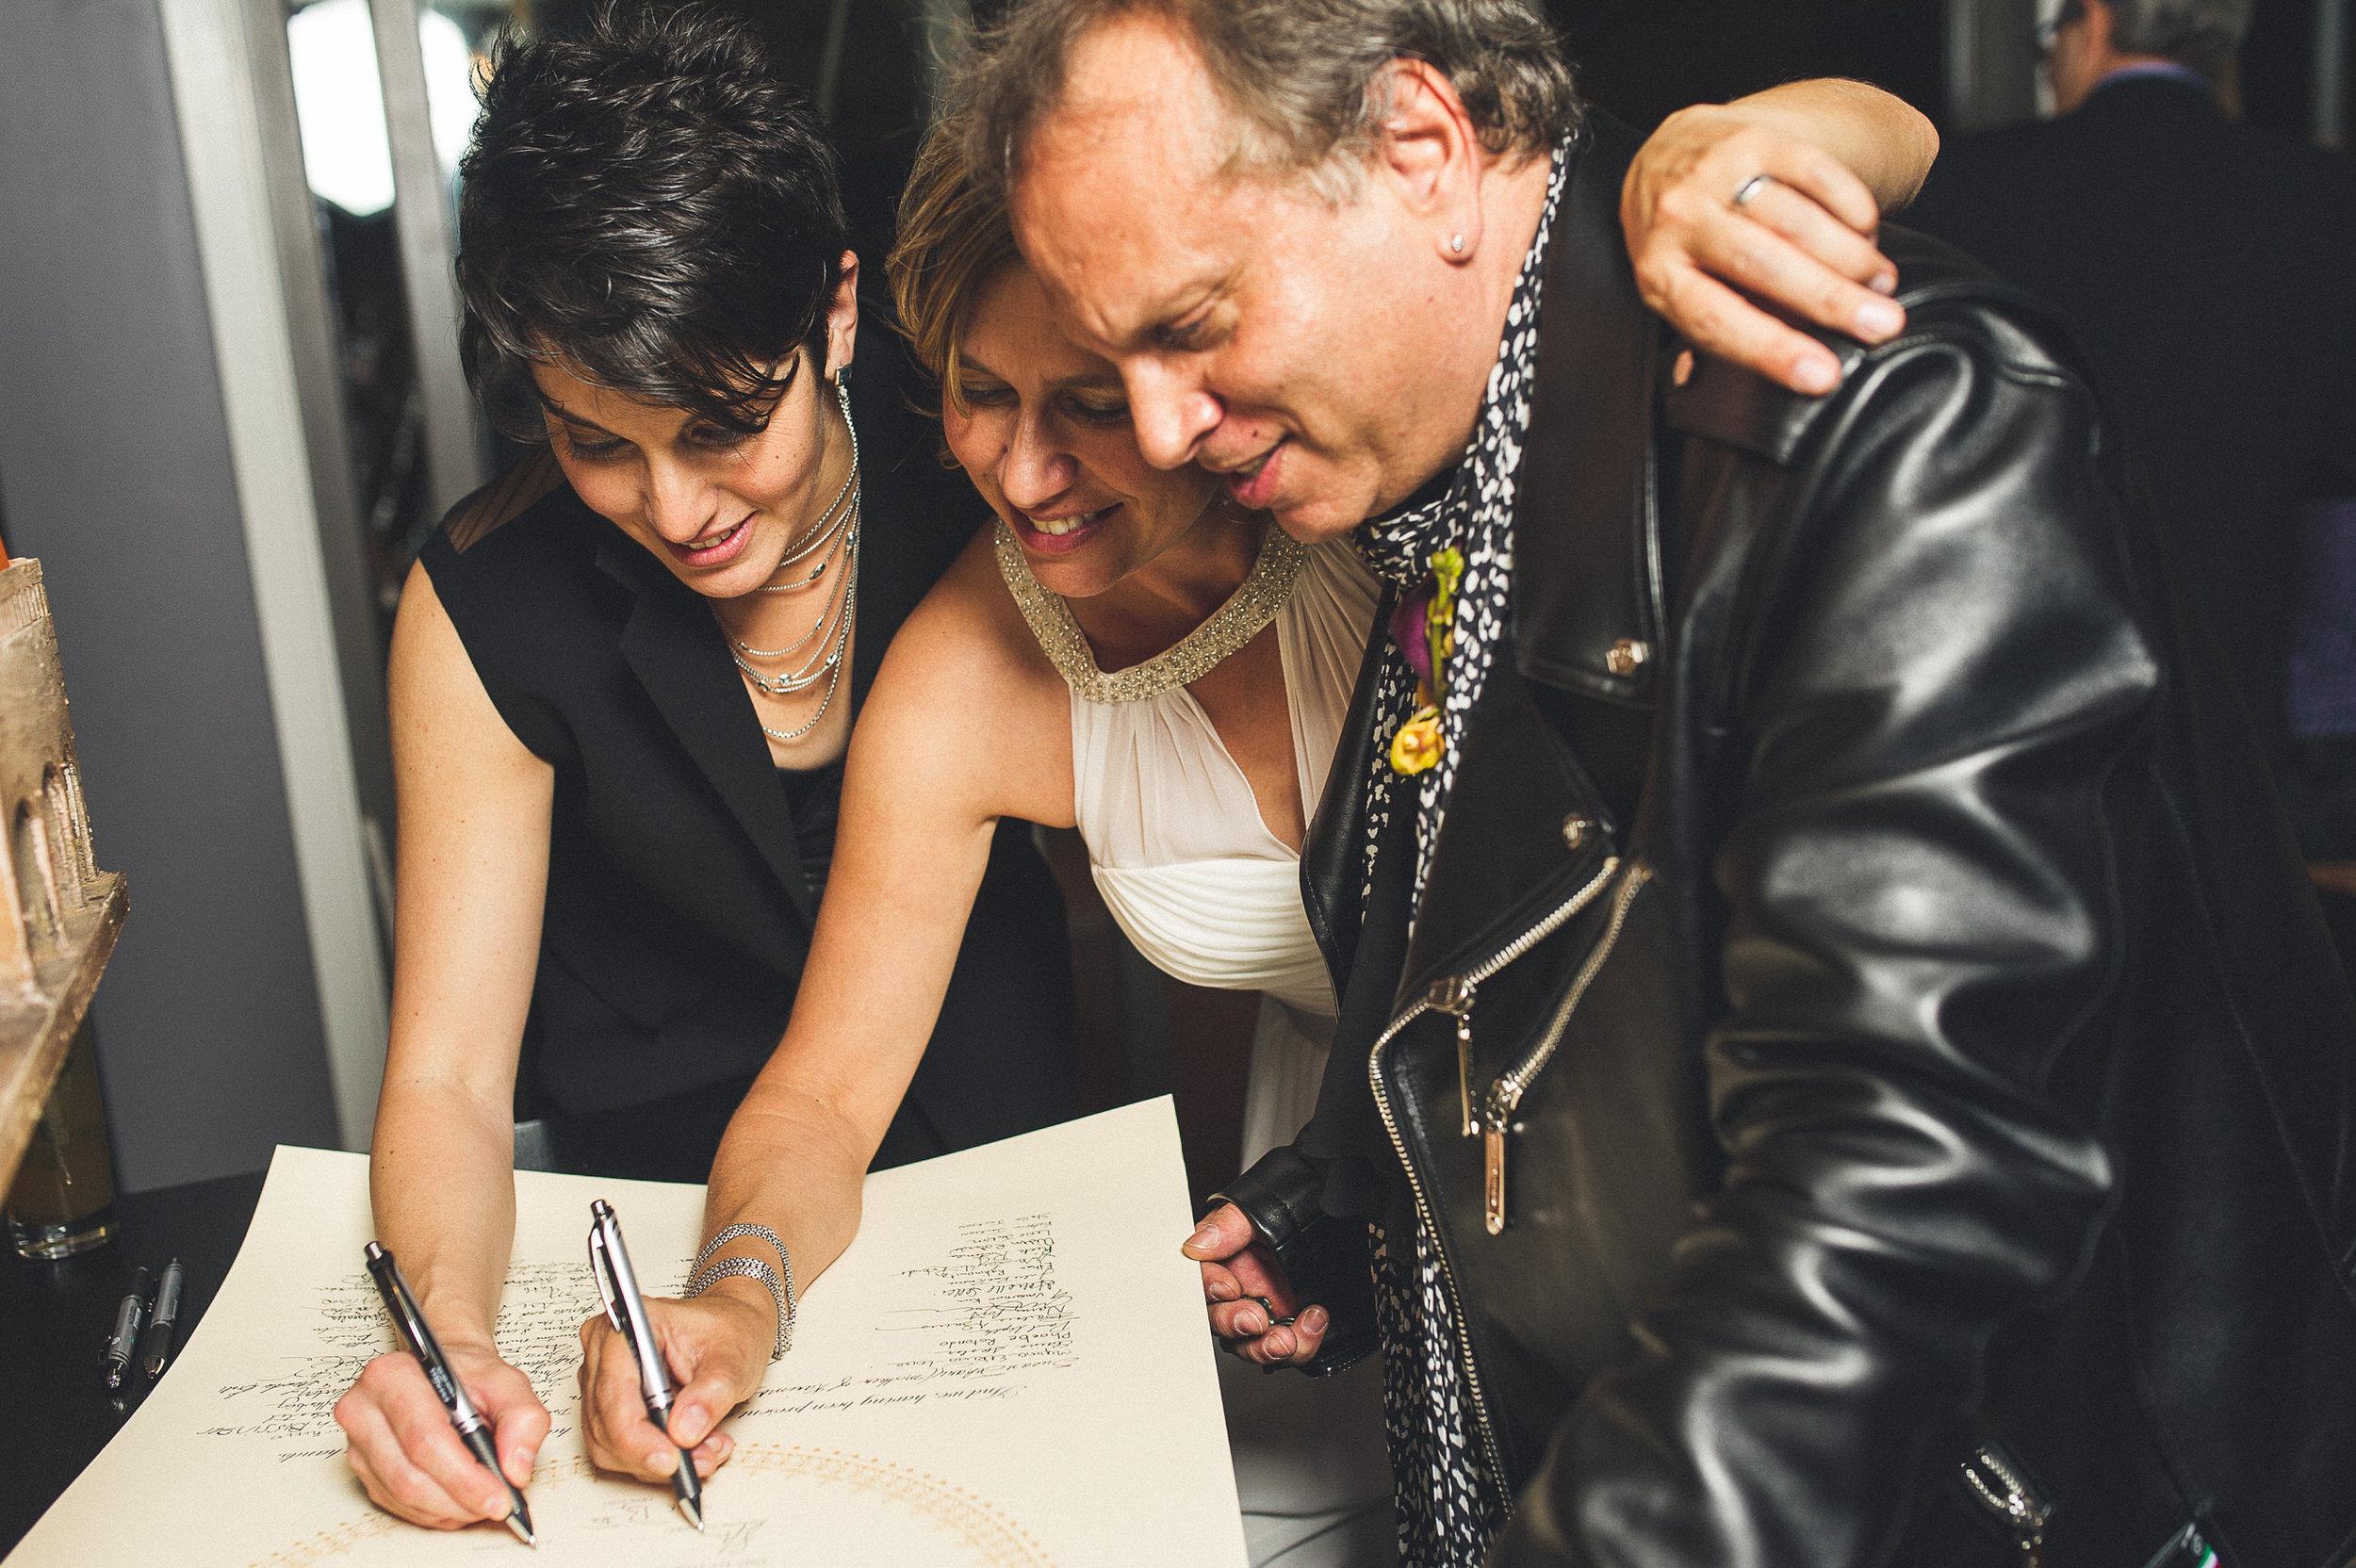 27 Philadelphia Wedding Planner At Home Wedding Marriage Certificate.jpg